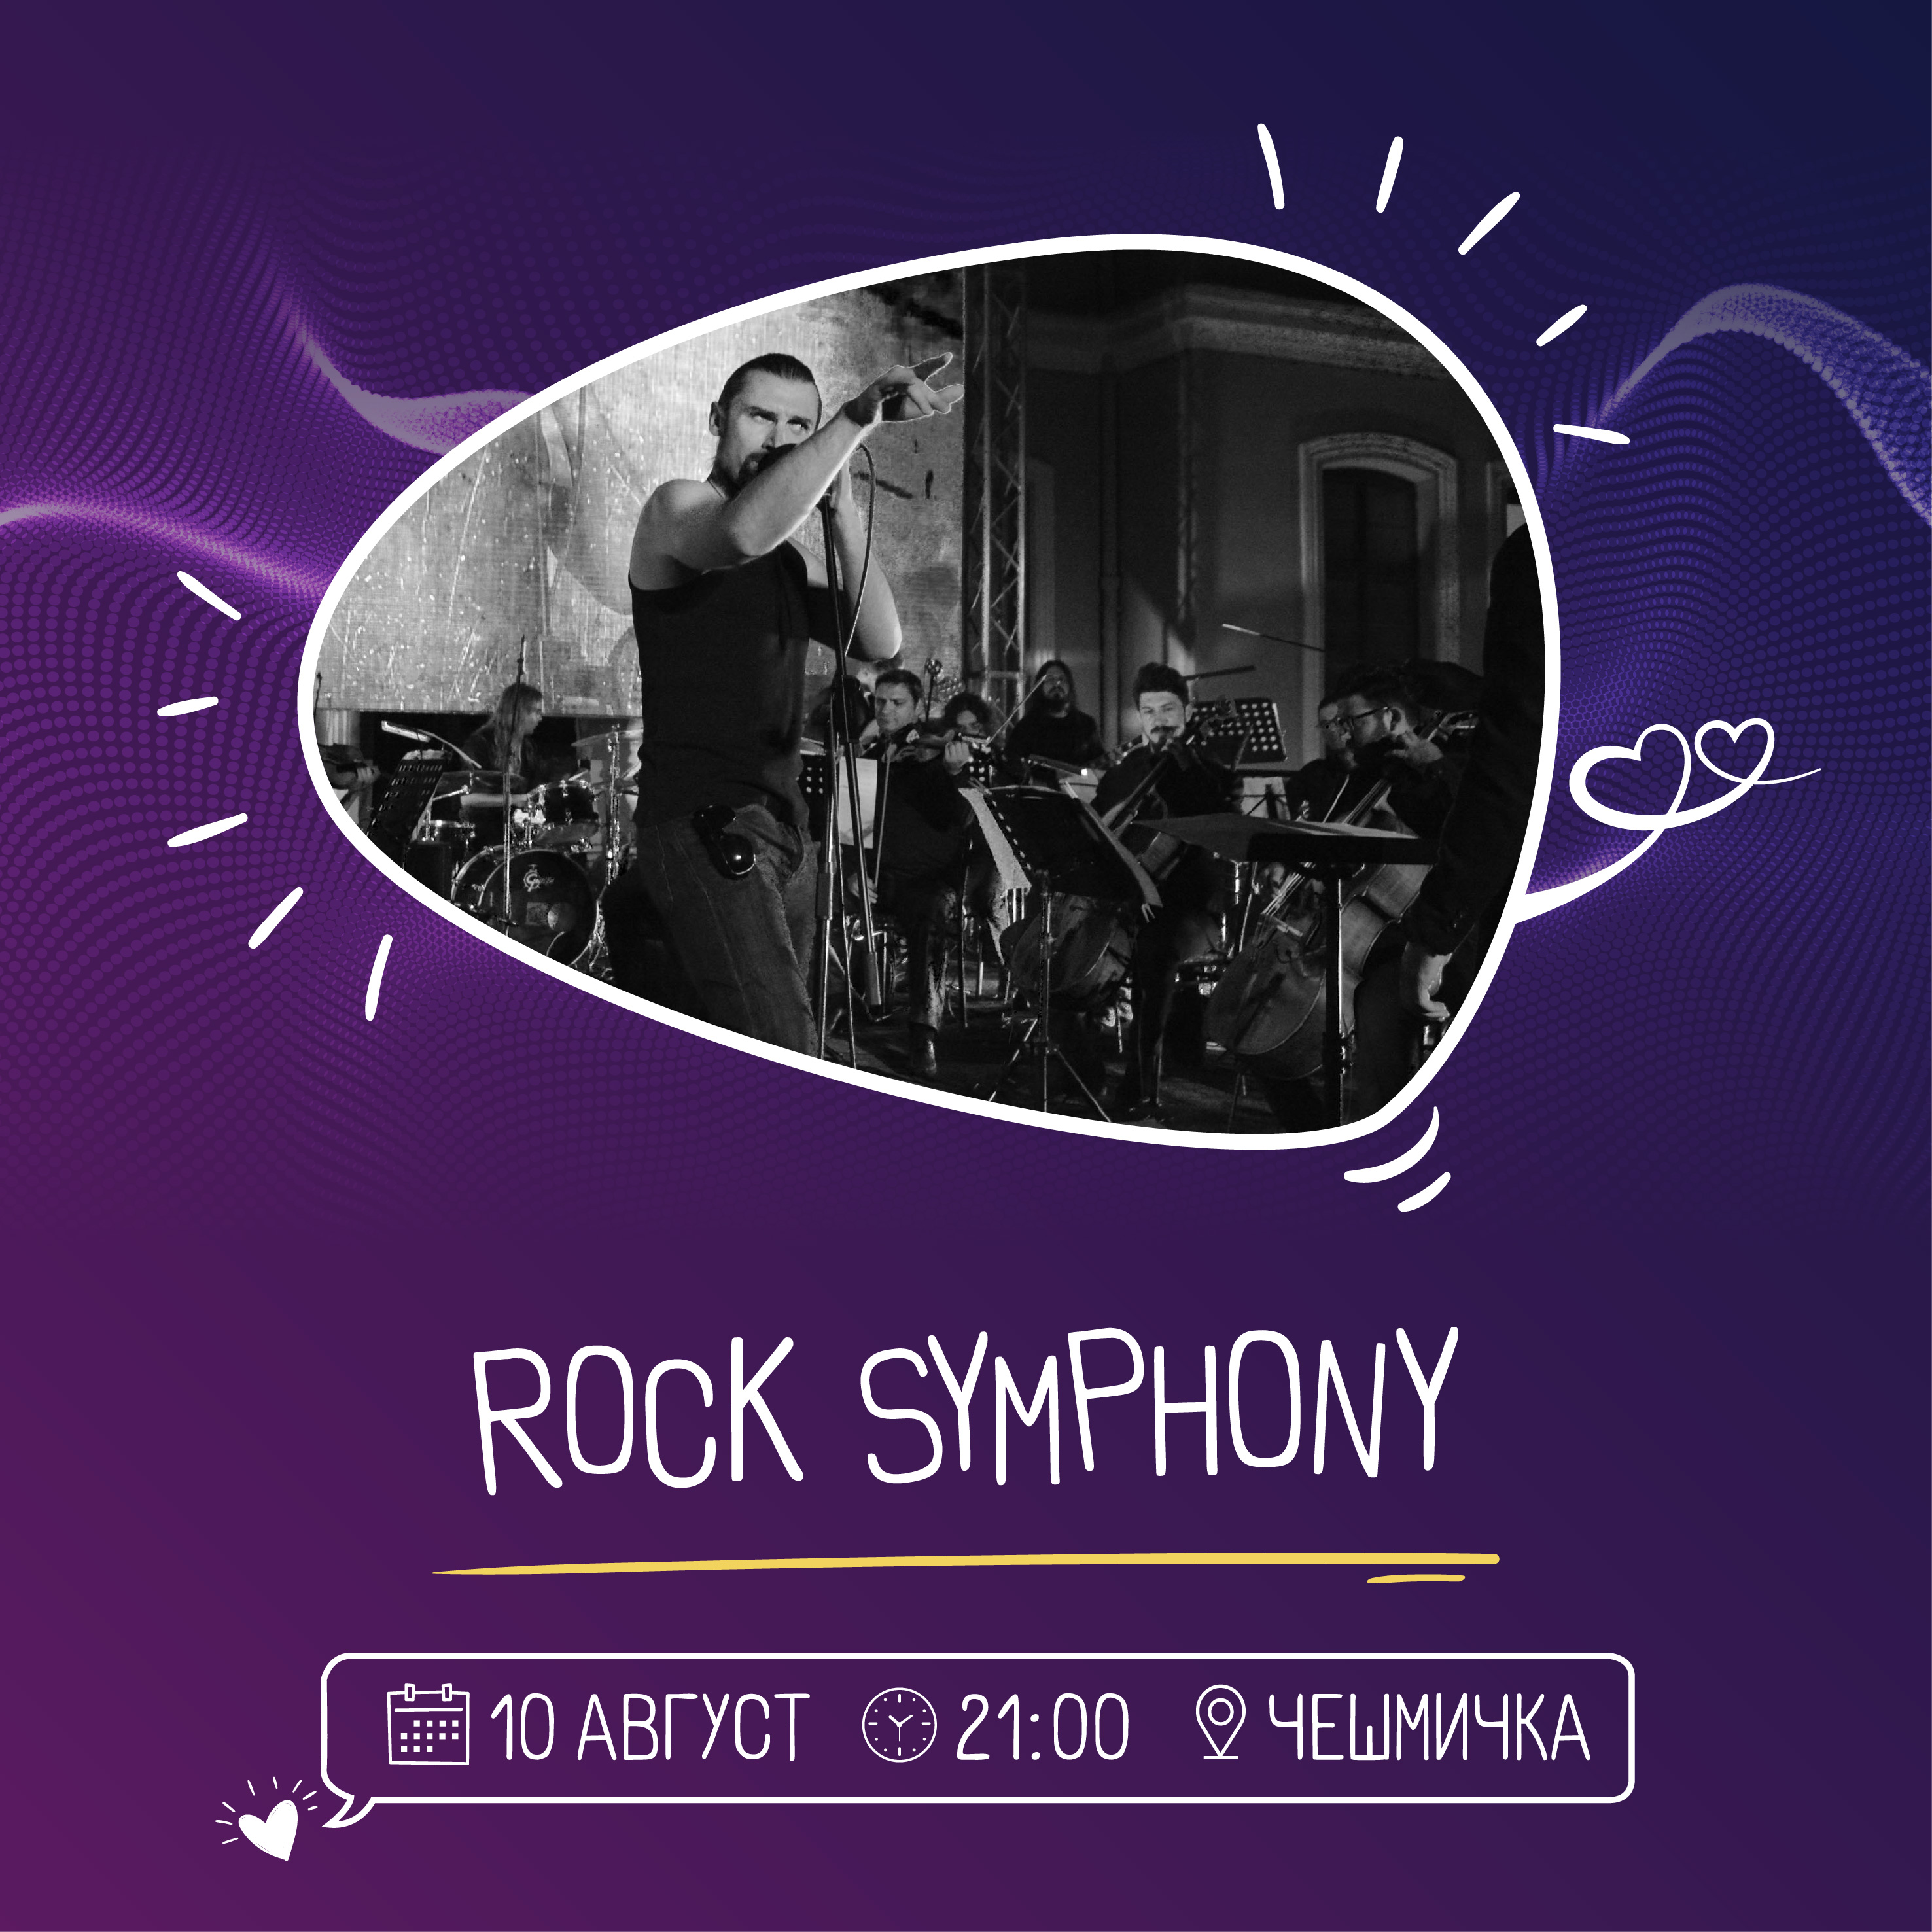 SOF Event - Rock Symphony